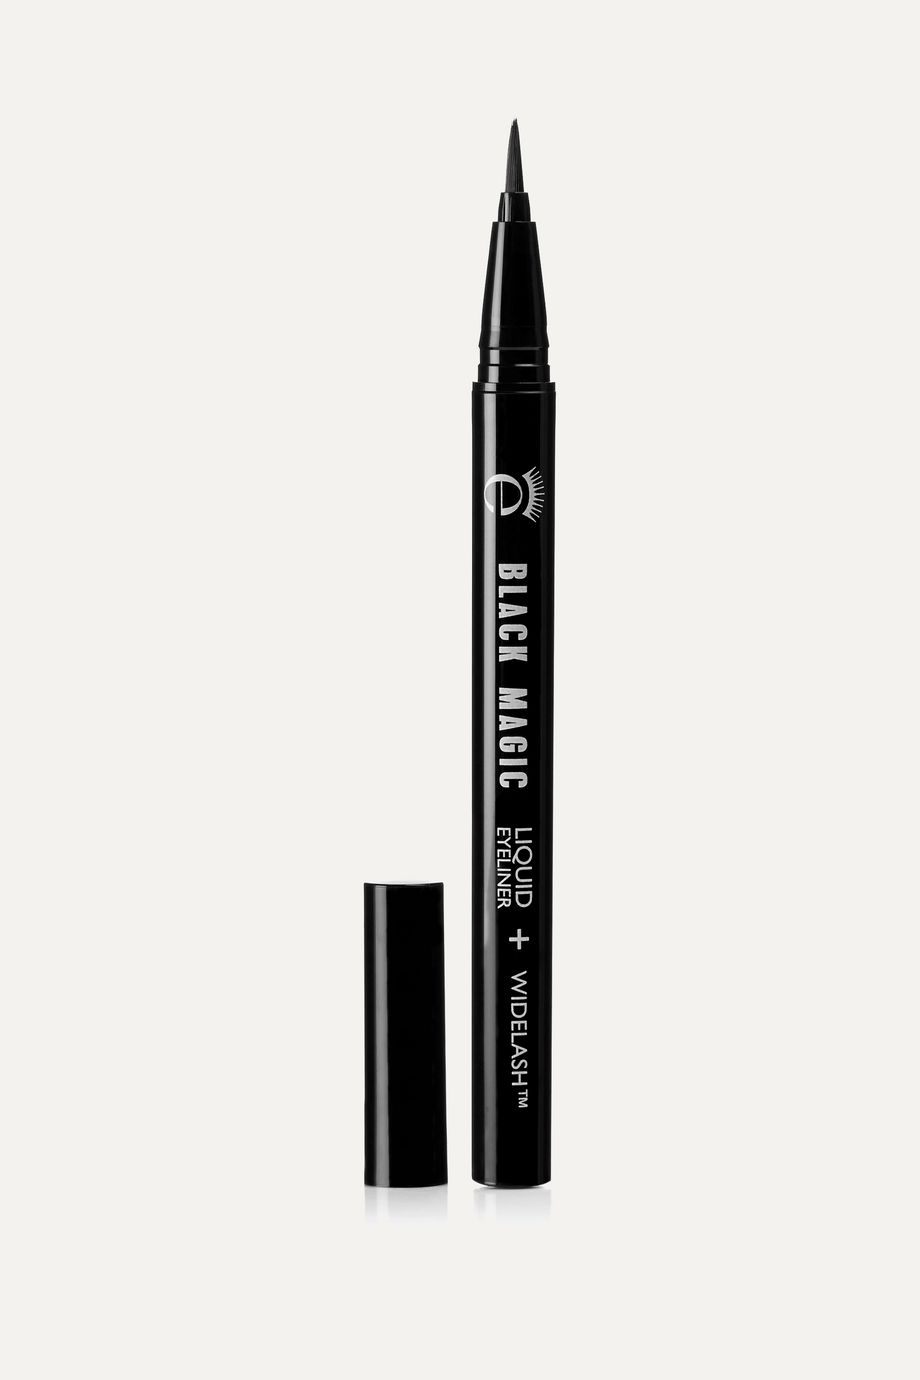 Eyeko Black Magic Liquid Eyeliner – Flüssiger Eyeliner